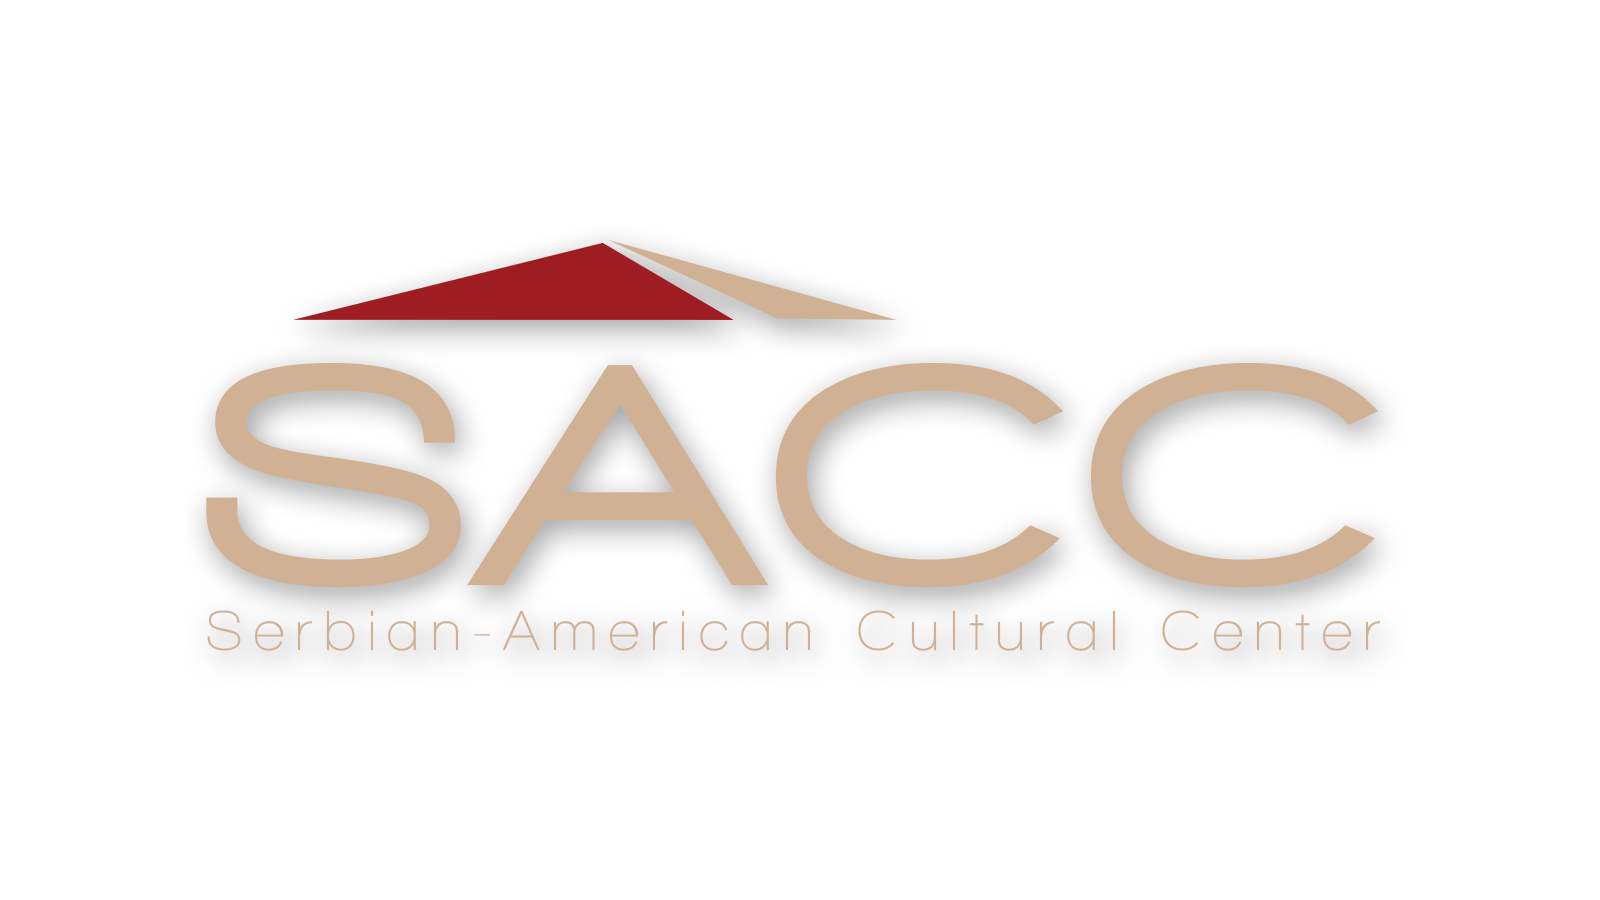 Serbian-American Cultural Center Logo